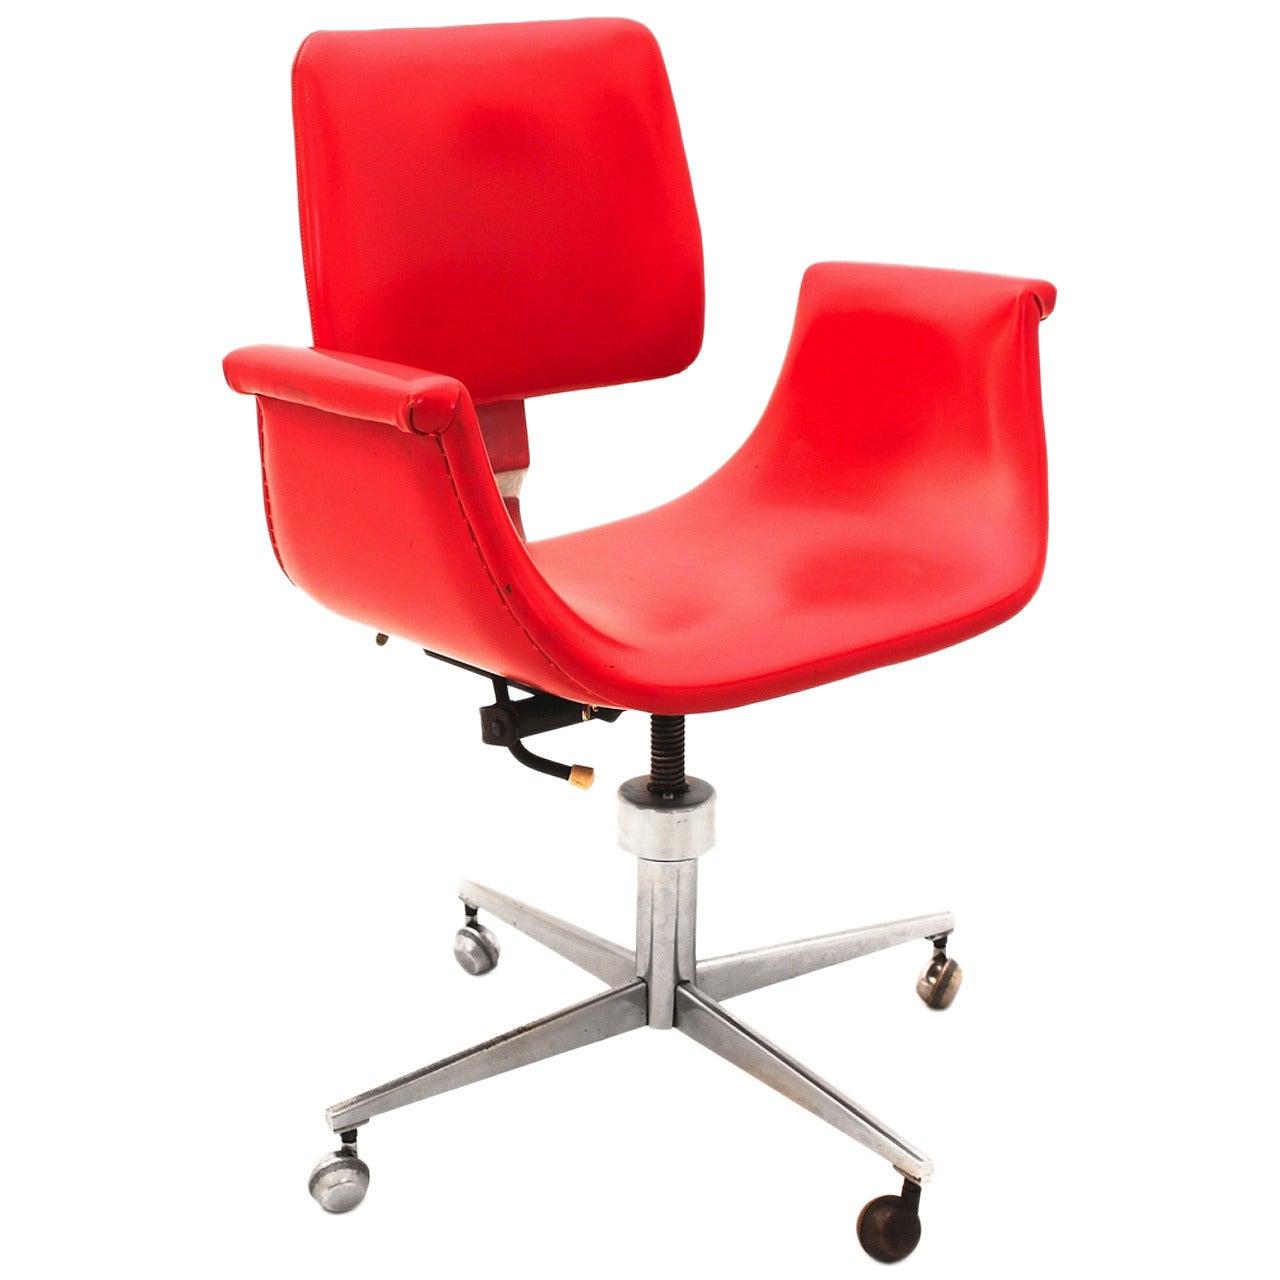 Mid-Century Modern Red Vintage Swivel Desk Chair, Italy, 1950